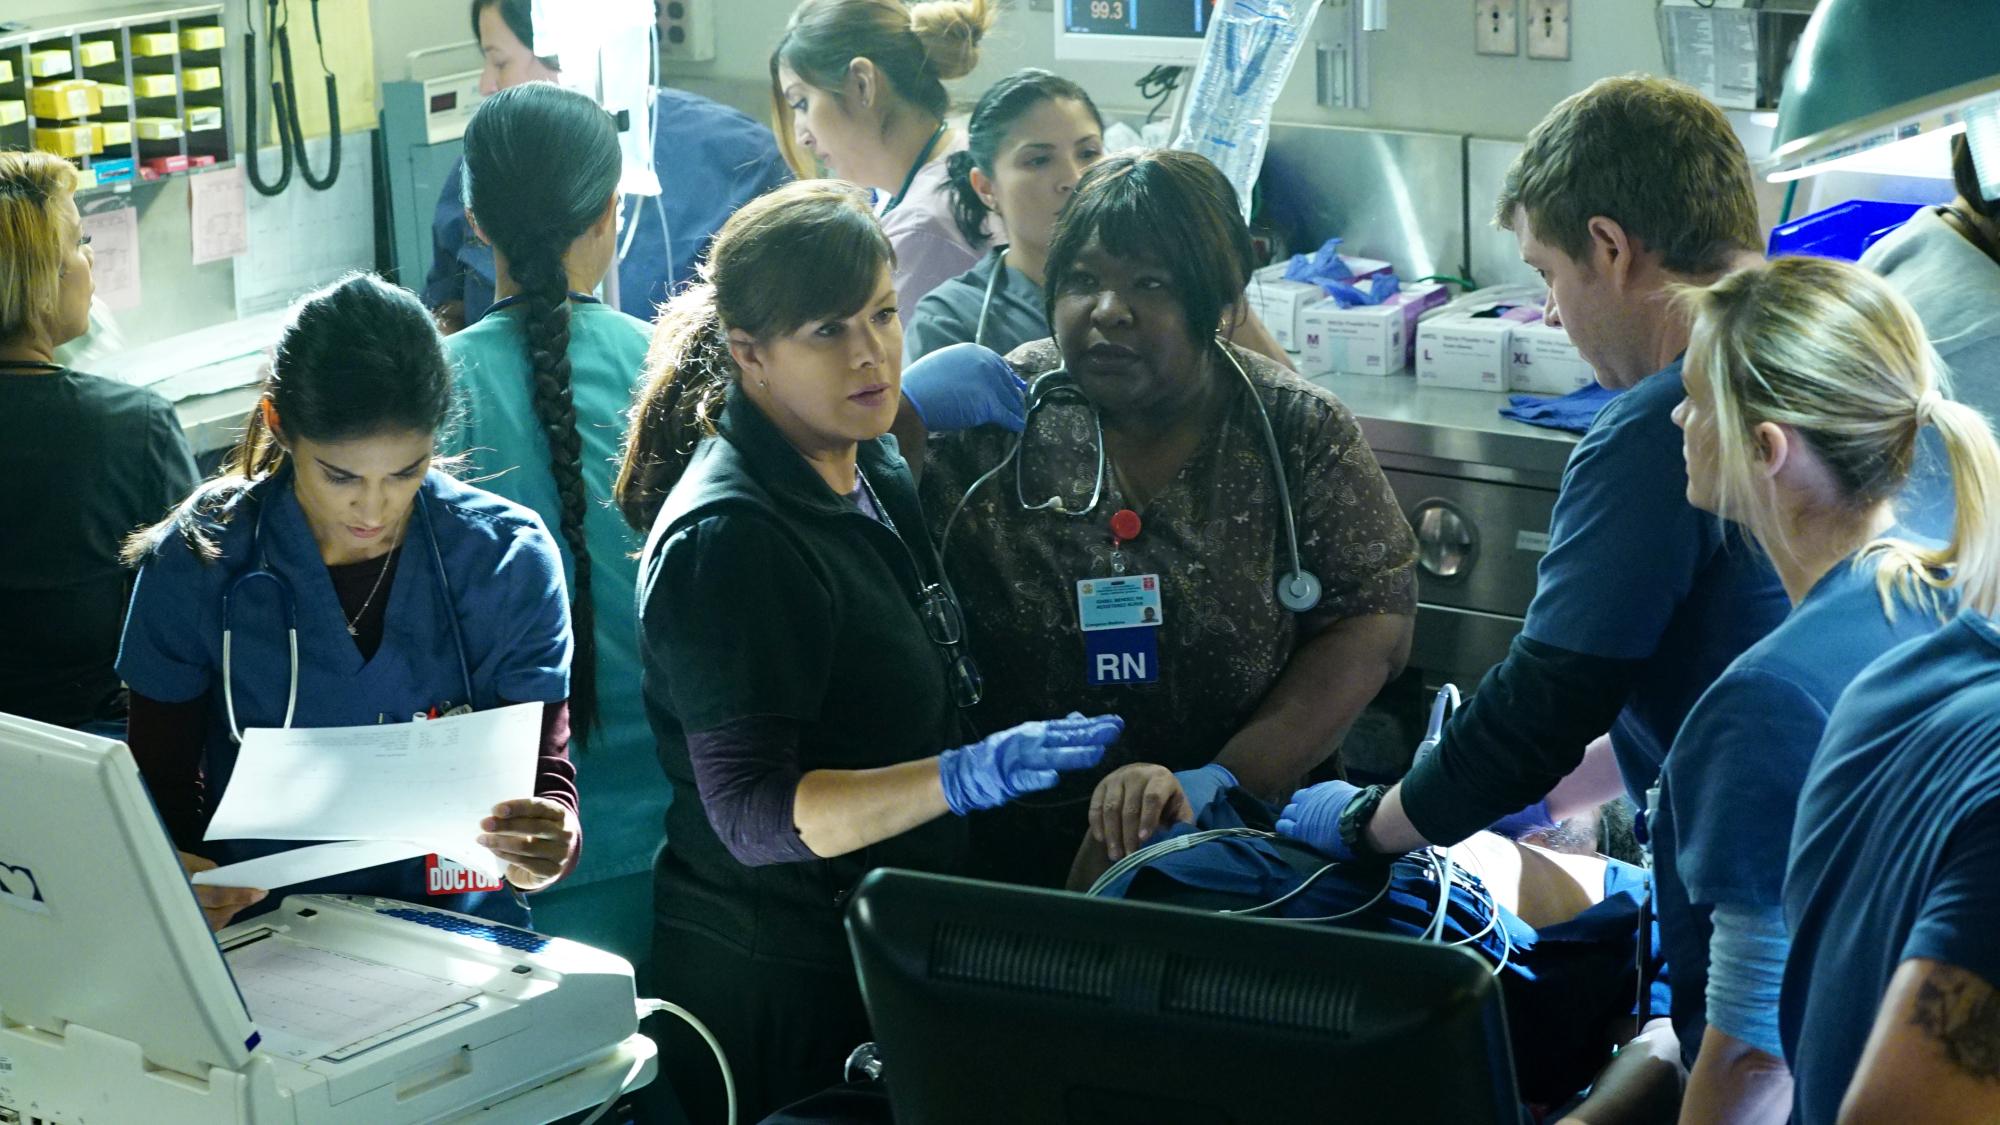 Melanie Chandra as Dr. Malaya Pineda and Marcia Gay Harden as Dr. Leanne Rorish